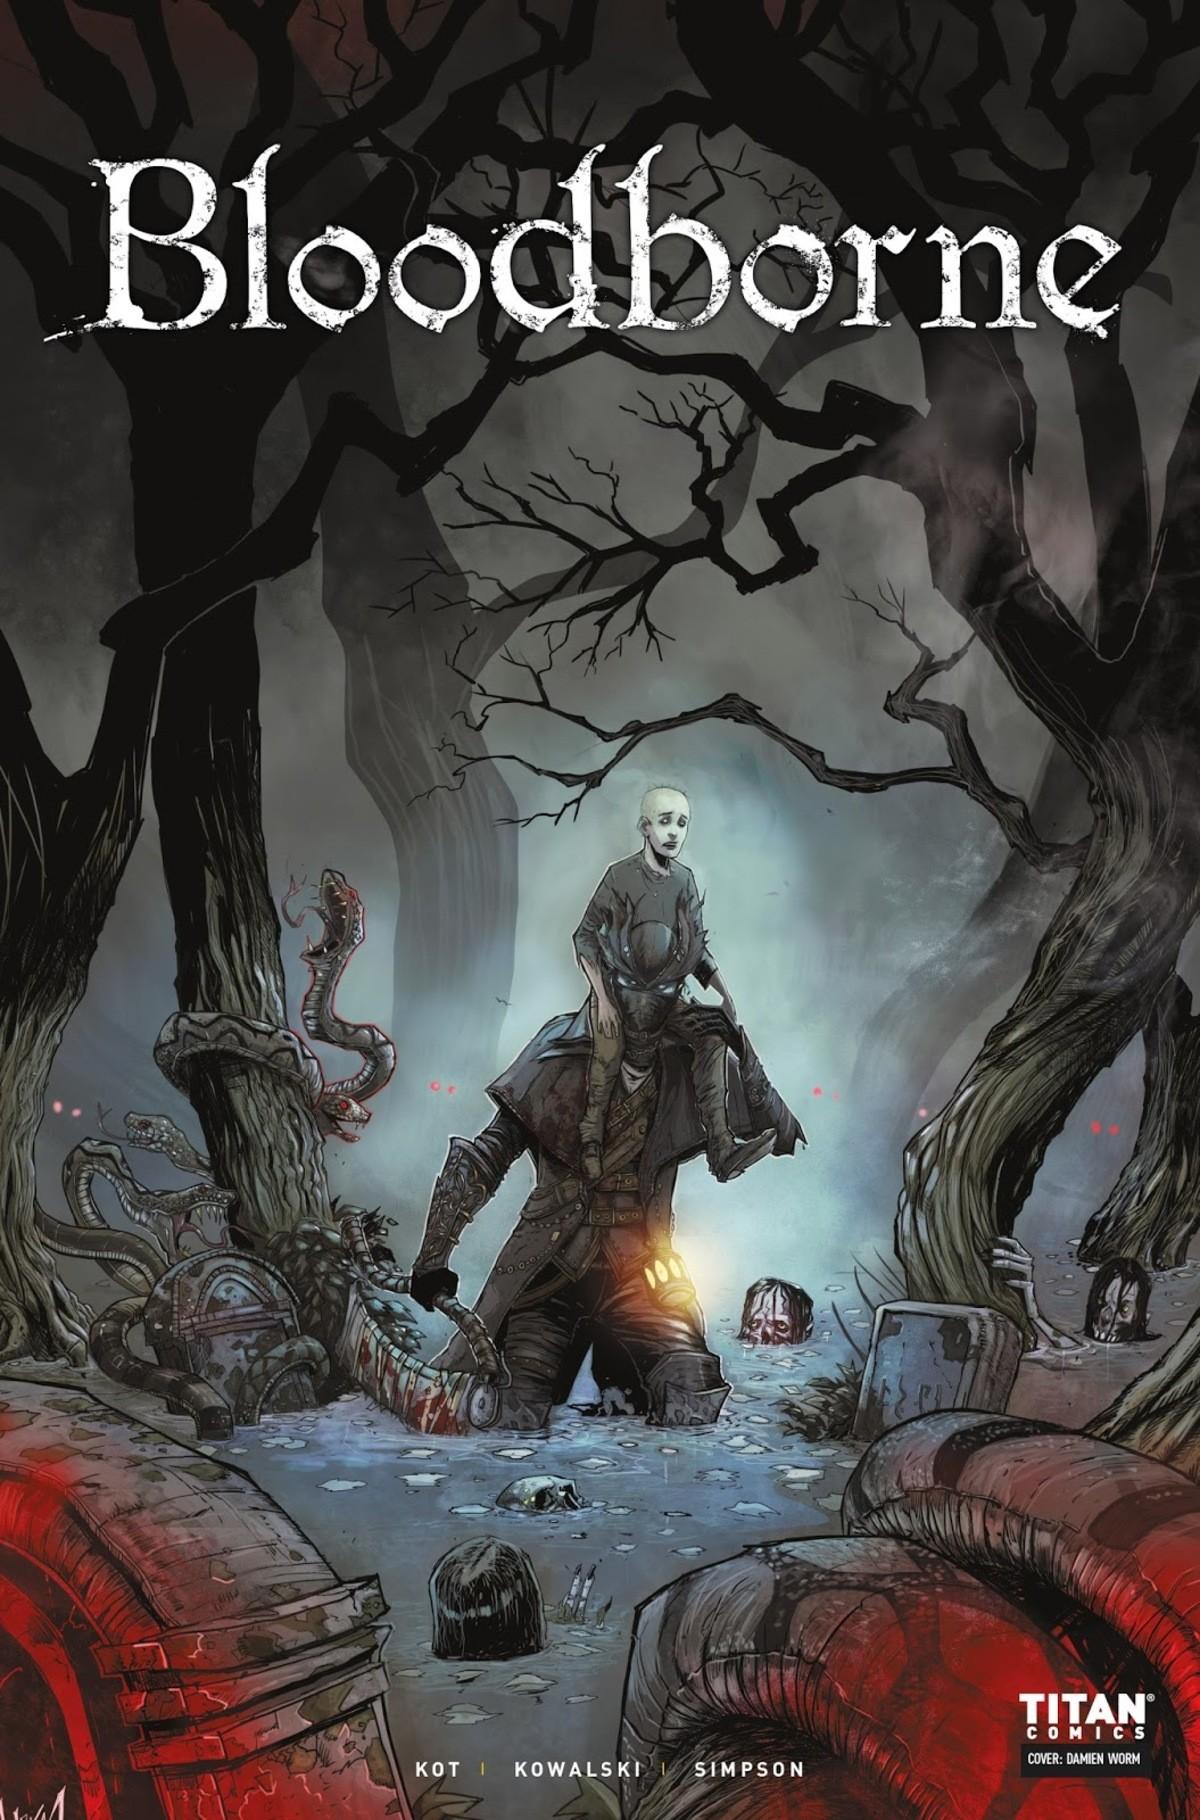 "Bloodborne #2. Bloodborne Issue 2. KOT I KOWALSKI l SIMPSON TITAN' mte:THE DEATH OF SLEEP ."" ISSUE 2 l.. f WRITTEN BY ARTWORK BY j. j. rii' i. i'. Aoeii Kot Pio"